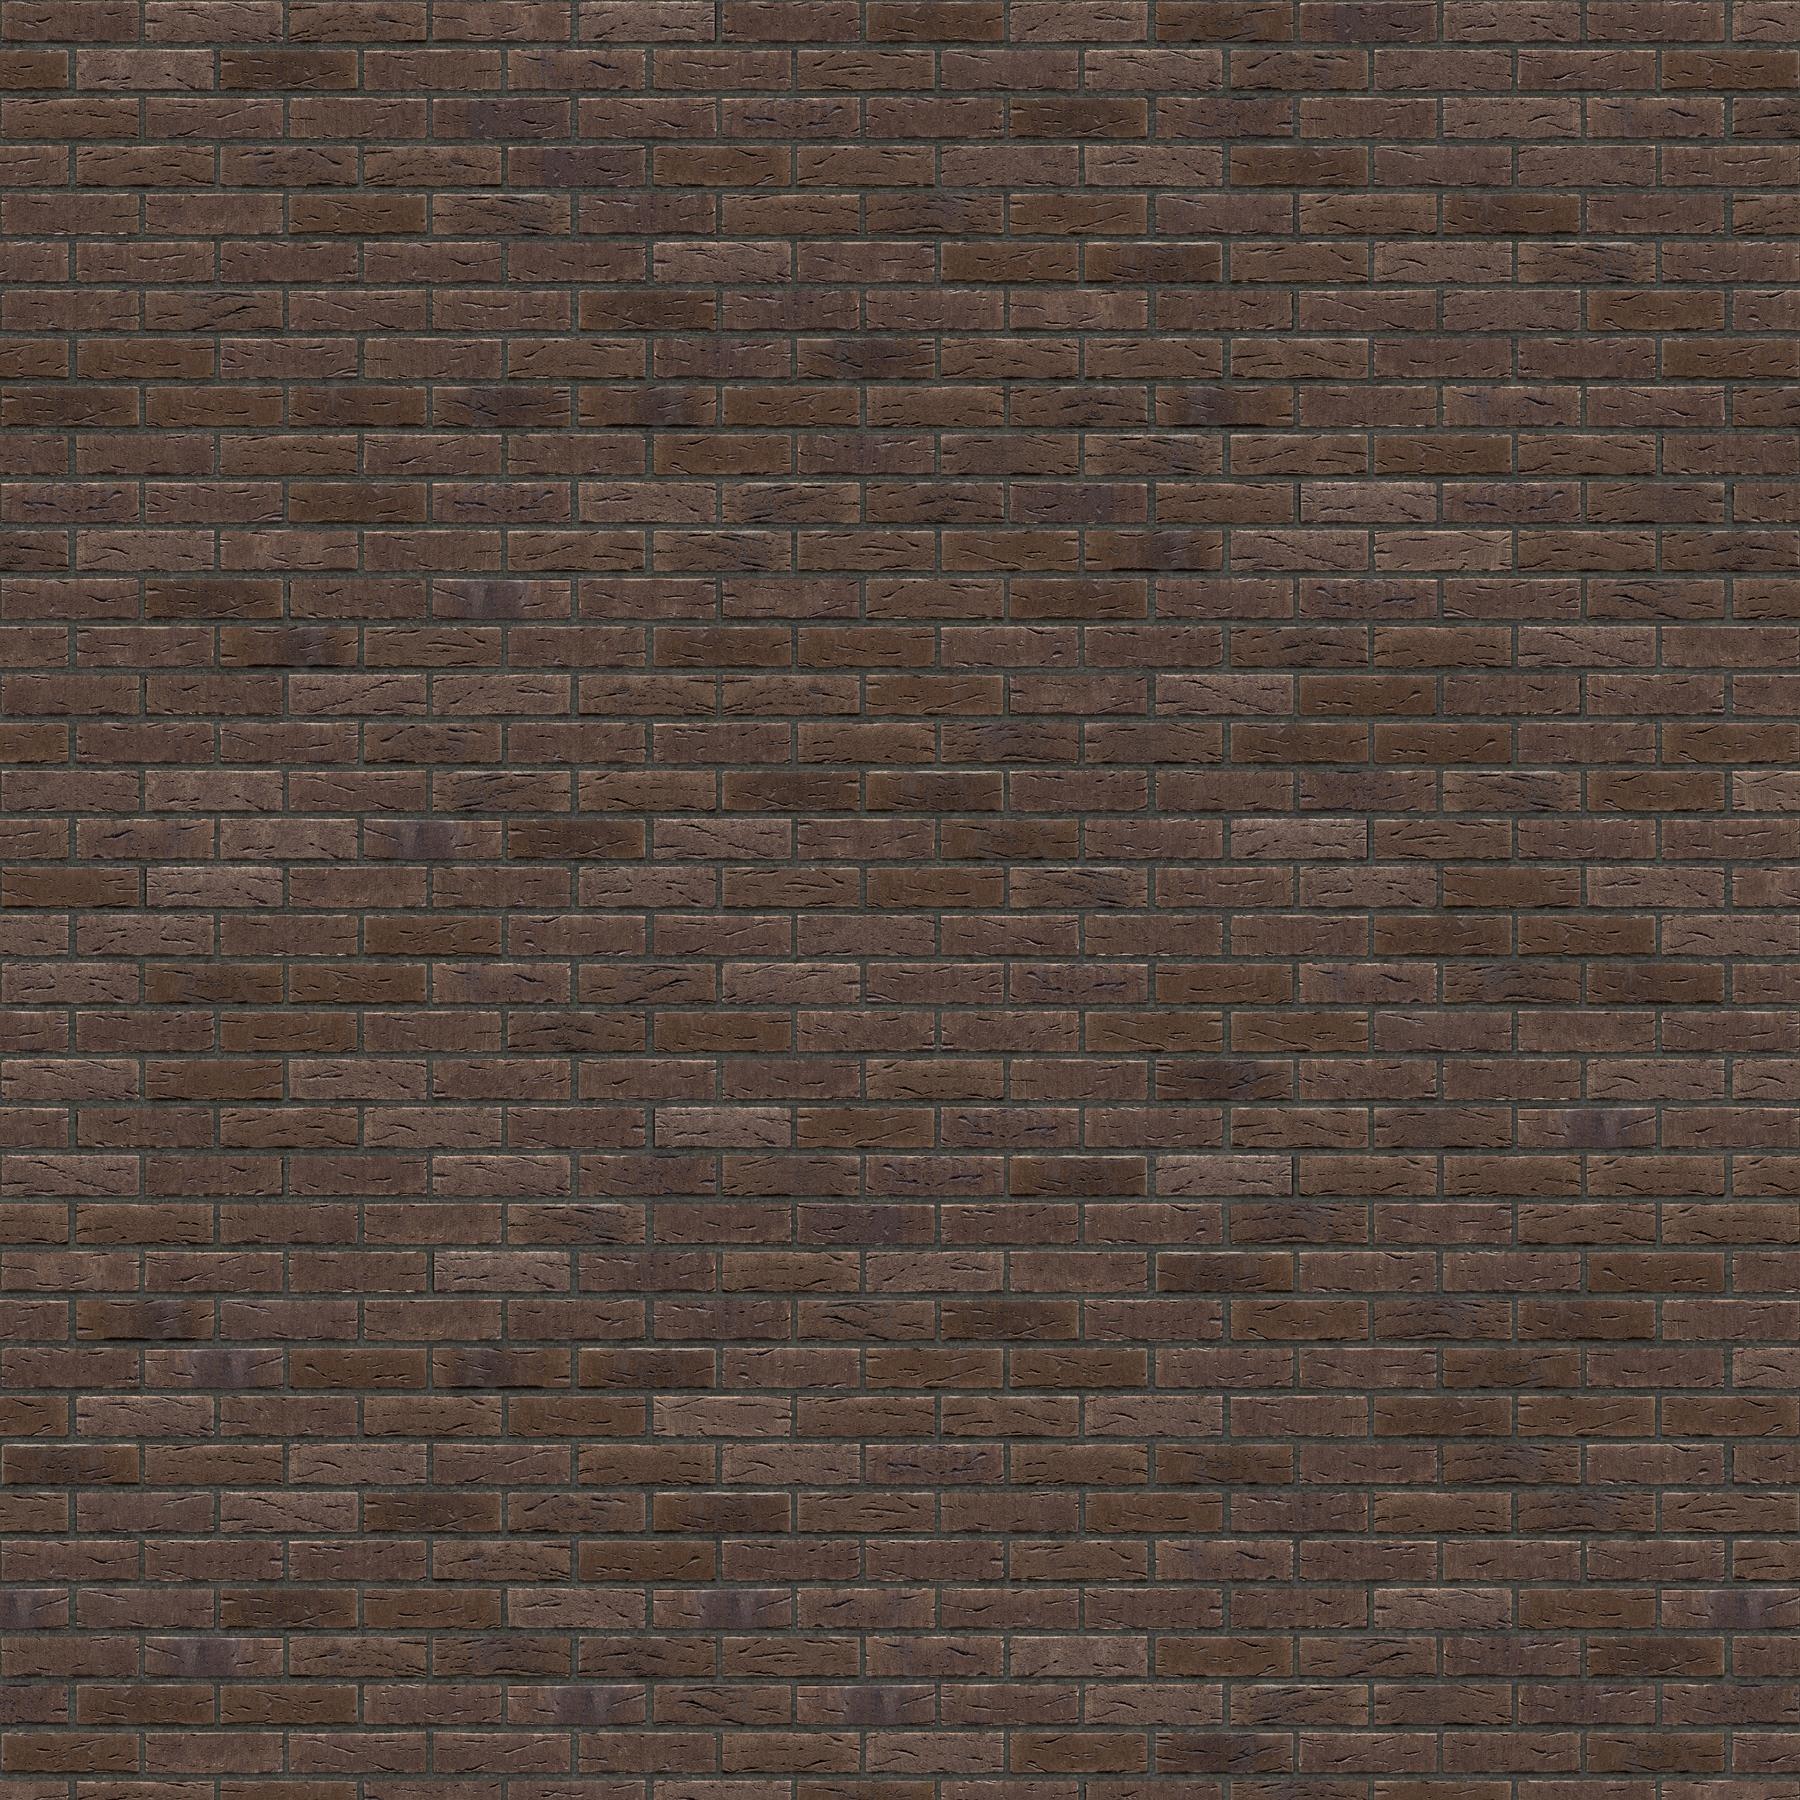 Dekorativna cigla listela FeldHaus Klinker r-669 nf Antracit Fuga